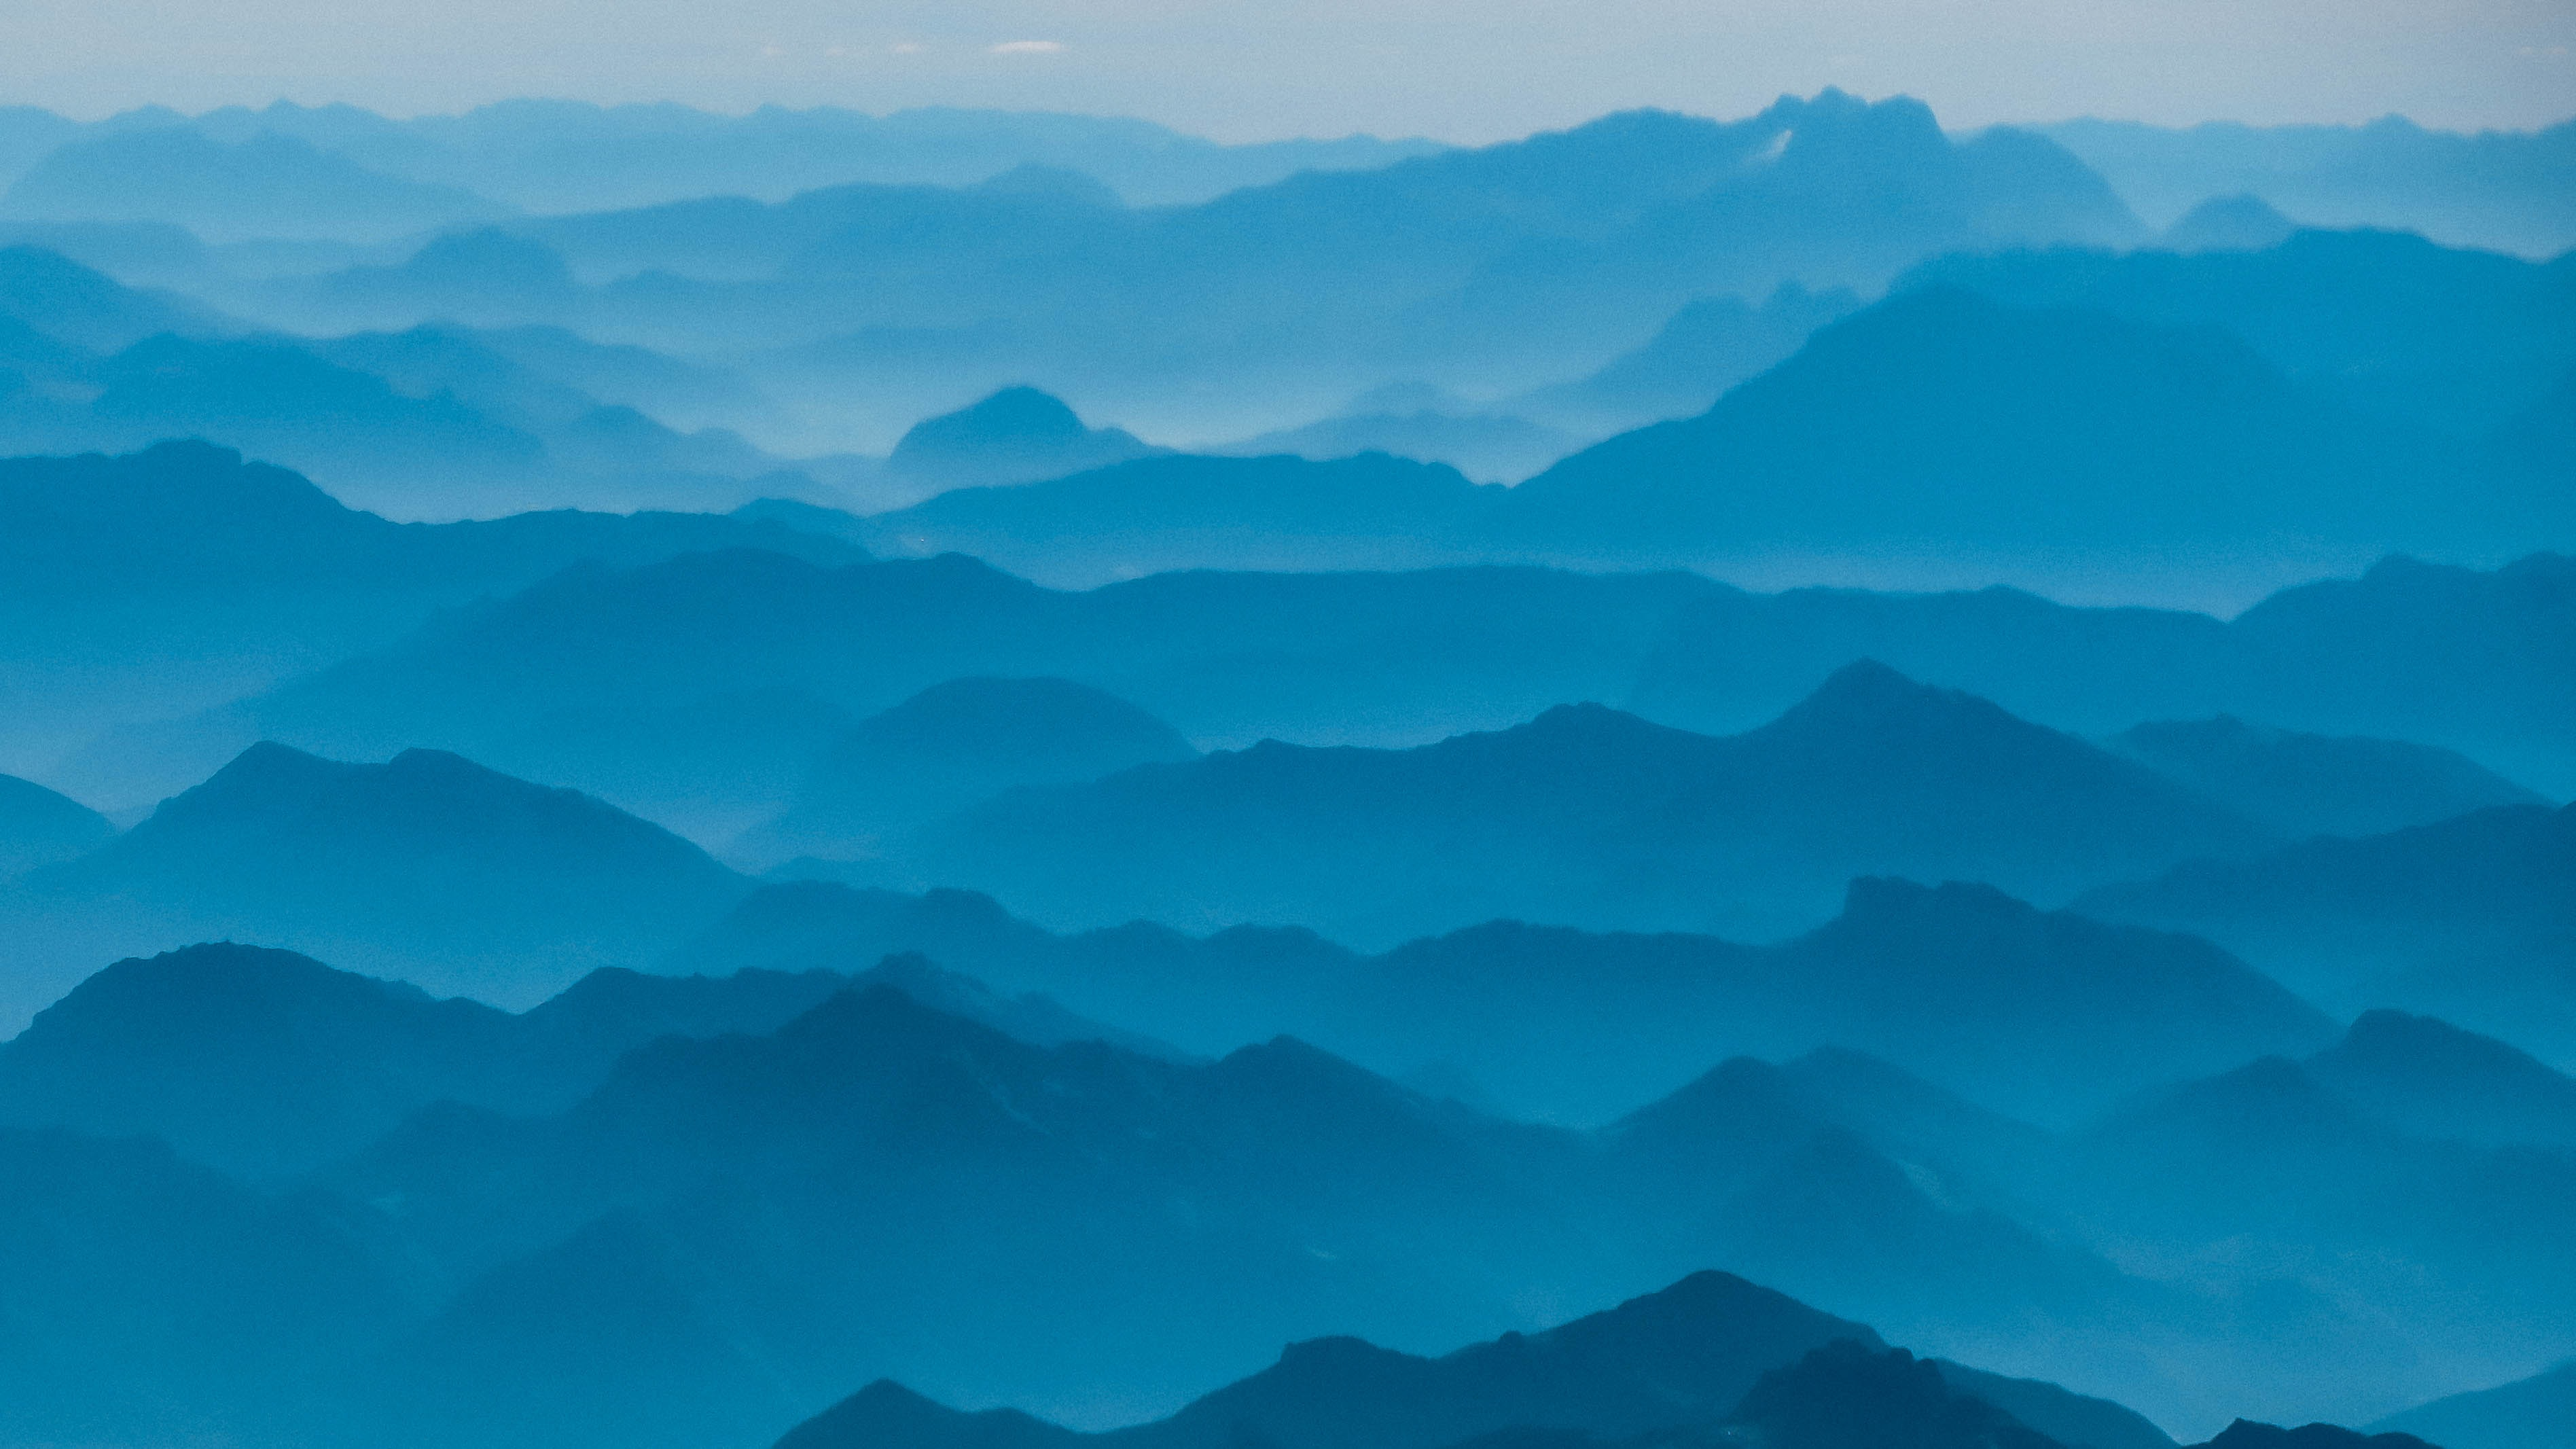 A series of parallel mountain ridges under a blue haze